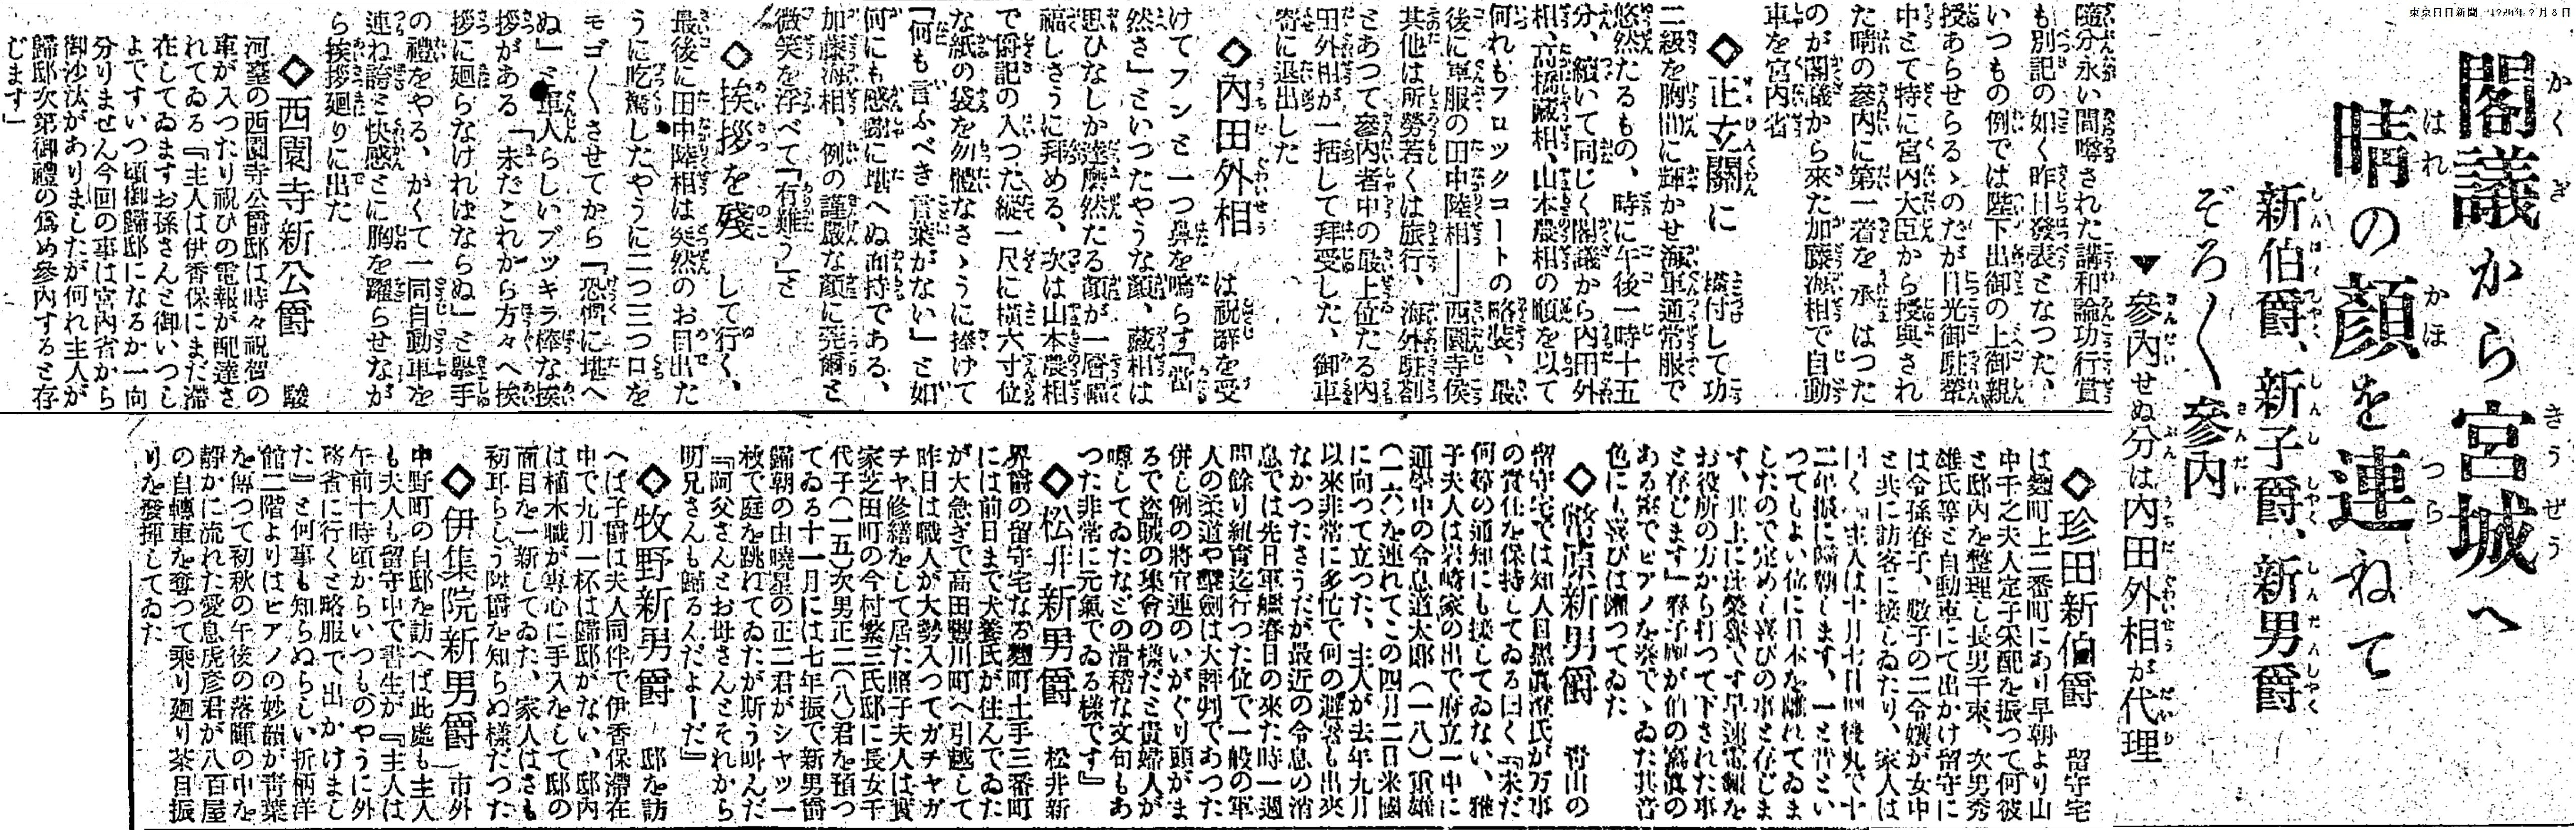 百年ニュース】1920(大正9)9月7日(火) 講和条約締結の論功行賞。西園寺公望 ...